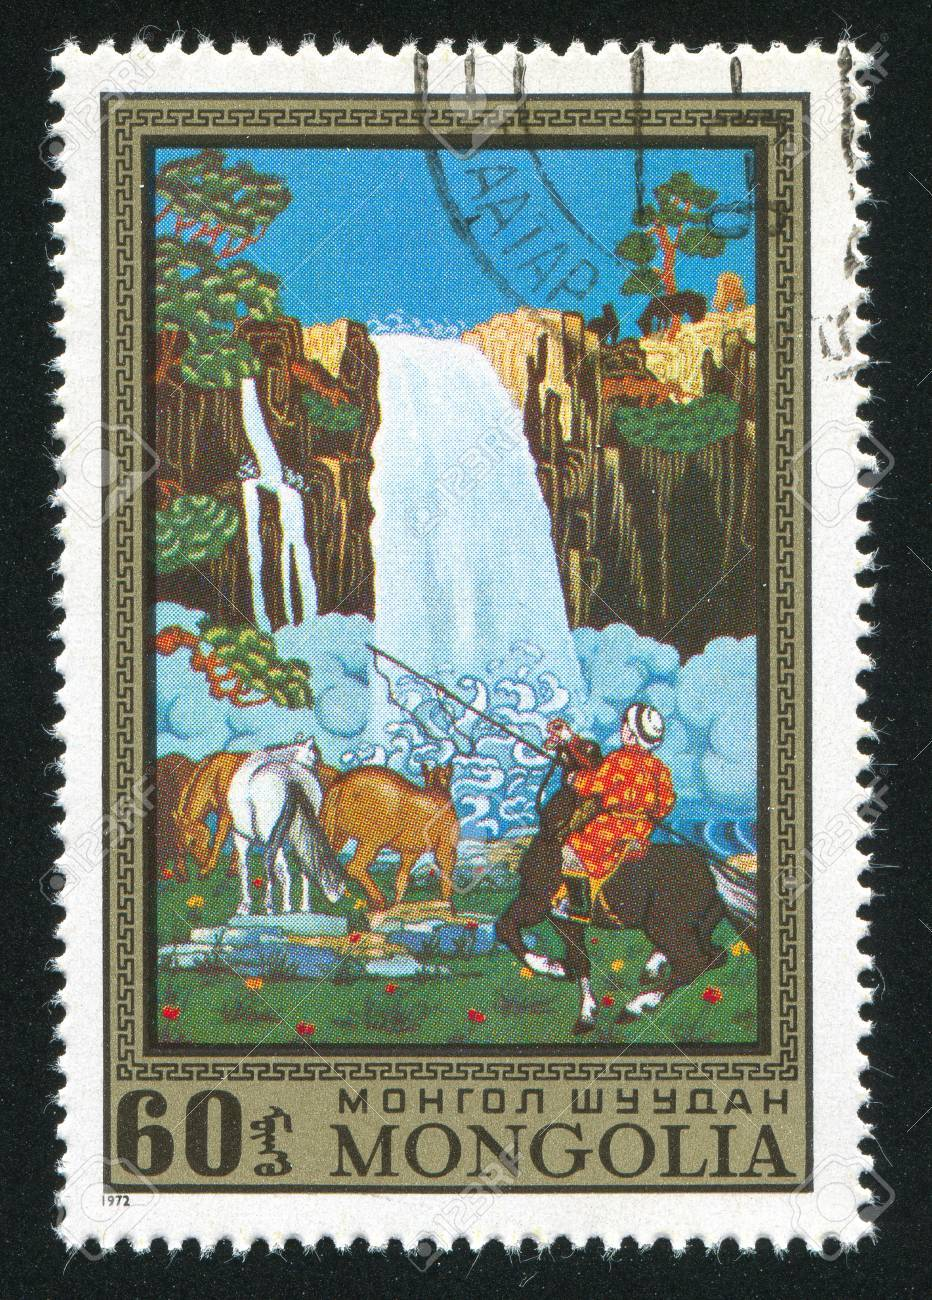 MONGOLIA - CIRCA 1972: stamp printed by Mongolia, shows Waterfall and horses, circa 1972 Stock Photo - 12594249